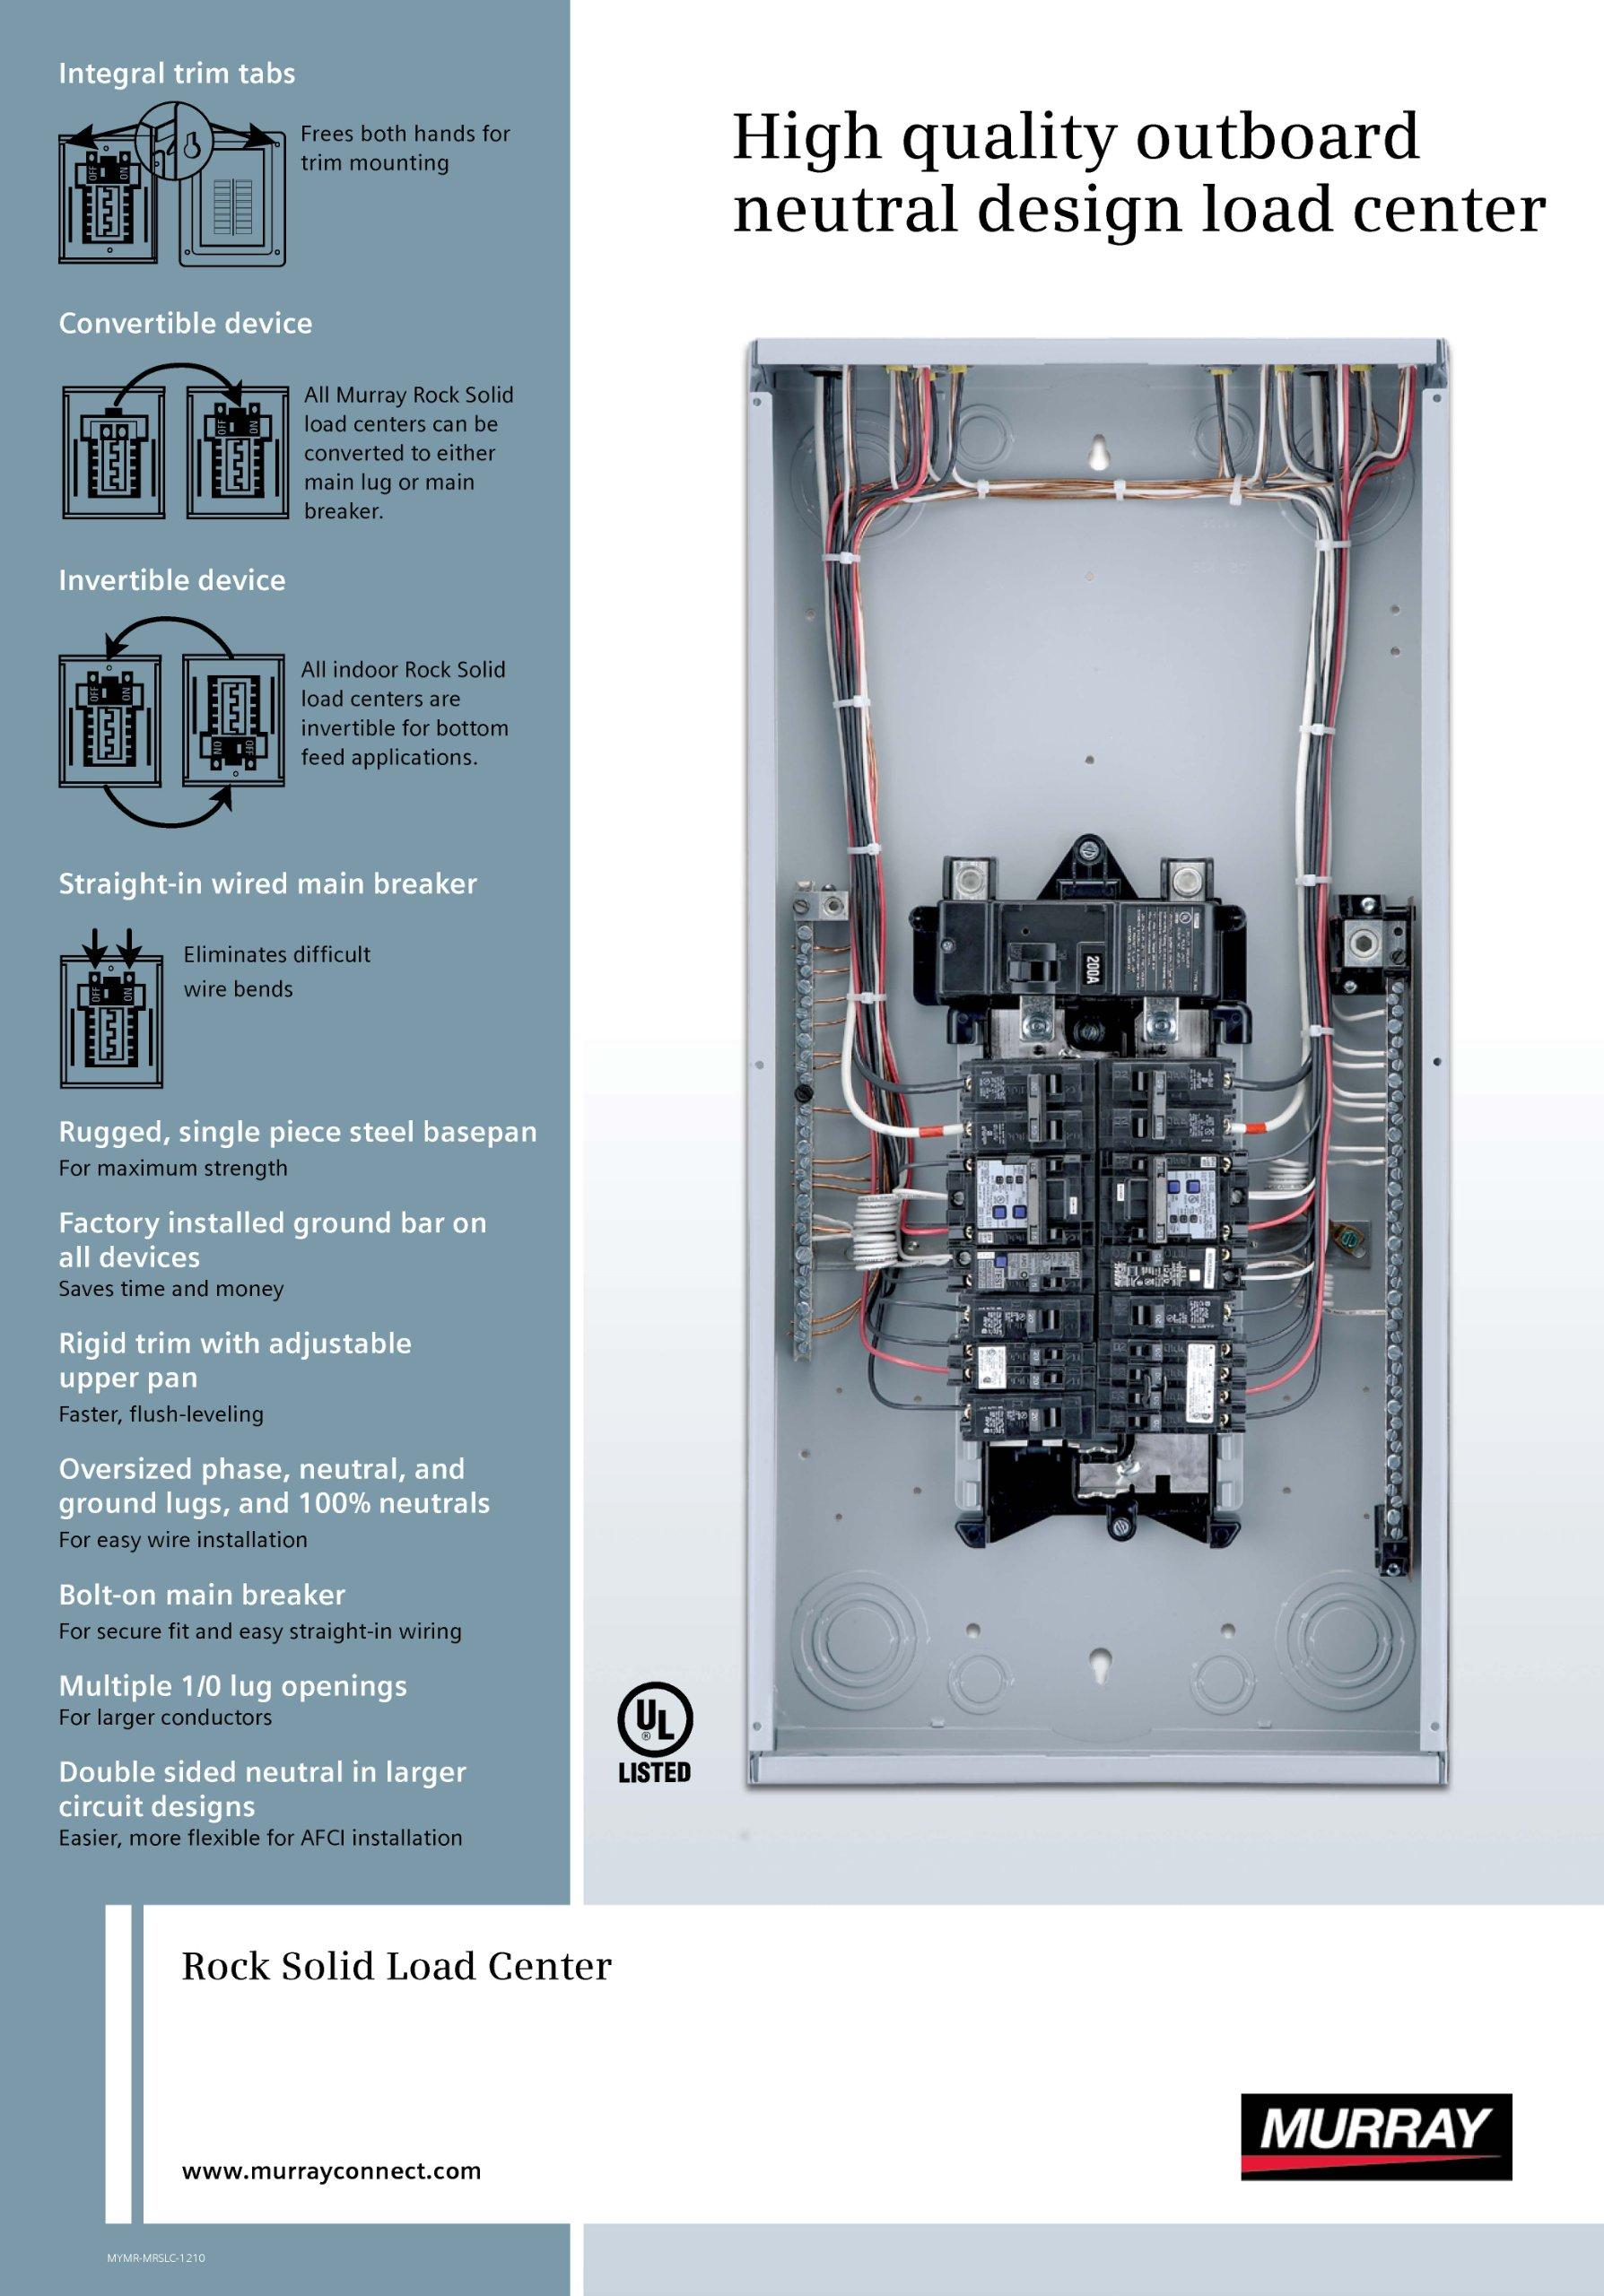 Murray Lc2440b1200 Generator Ready Load Center 30 Space 42 Circuit 225 Amp Main Lug Indoor